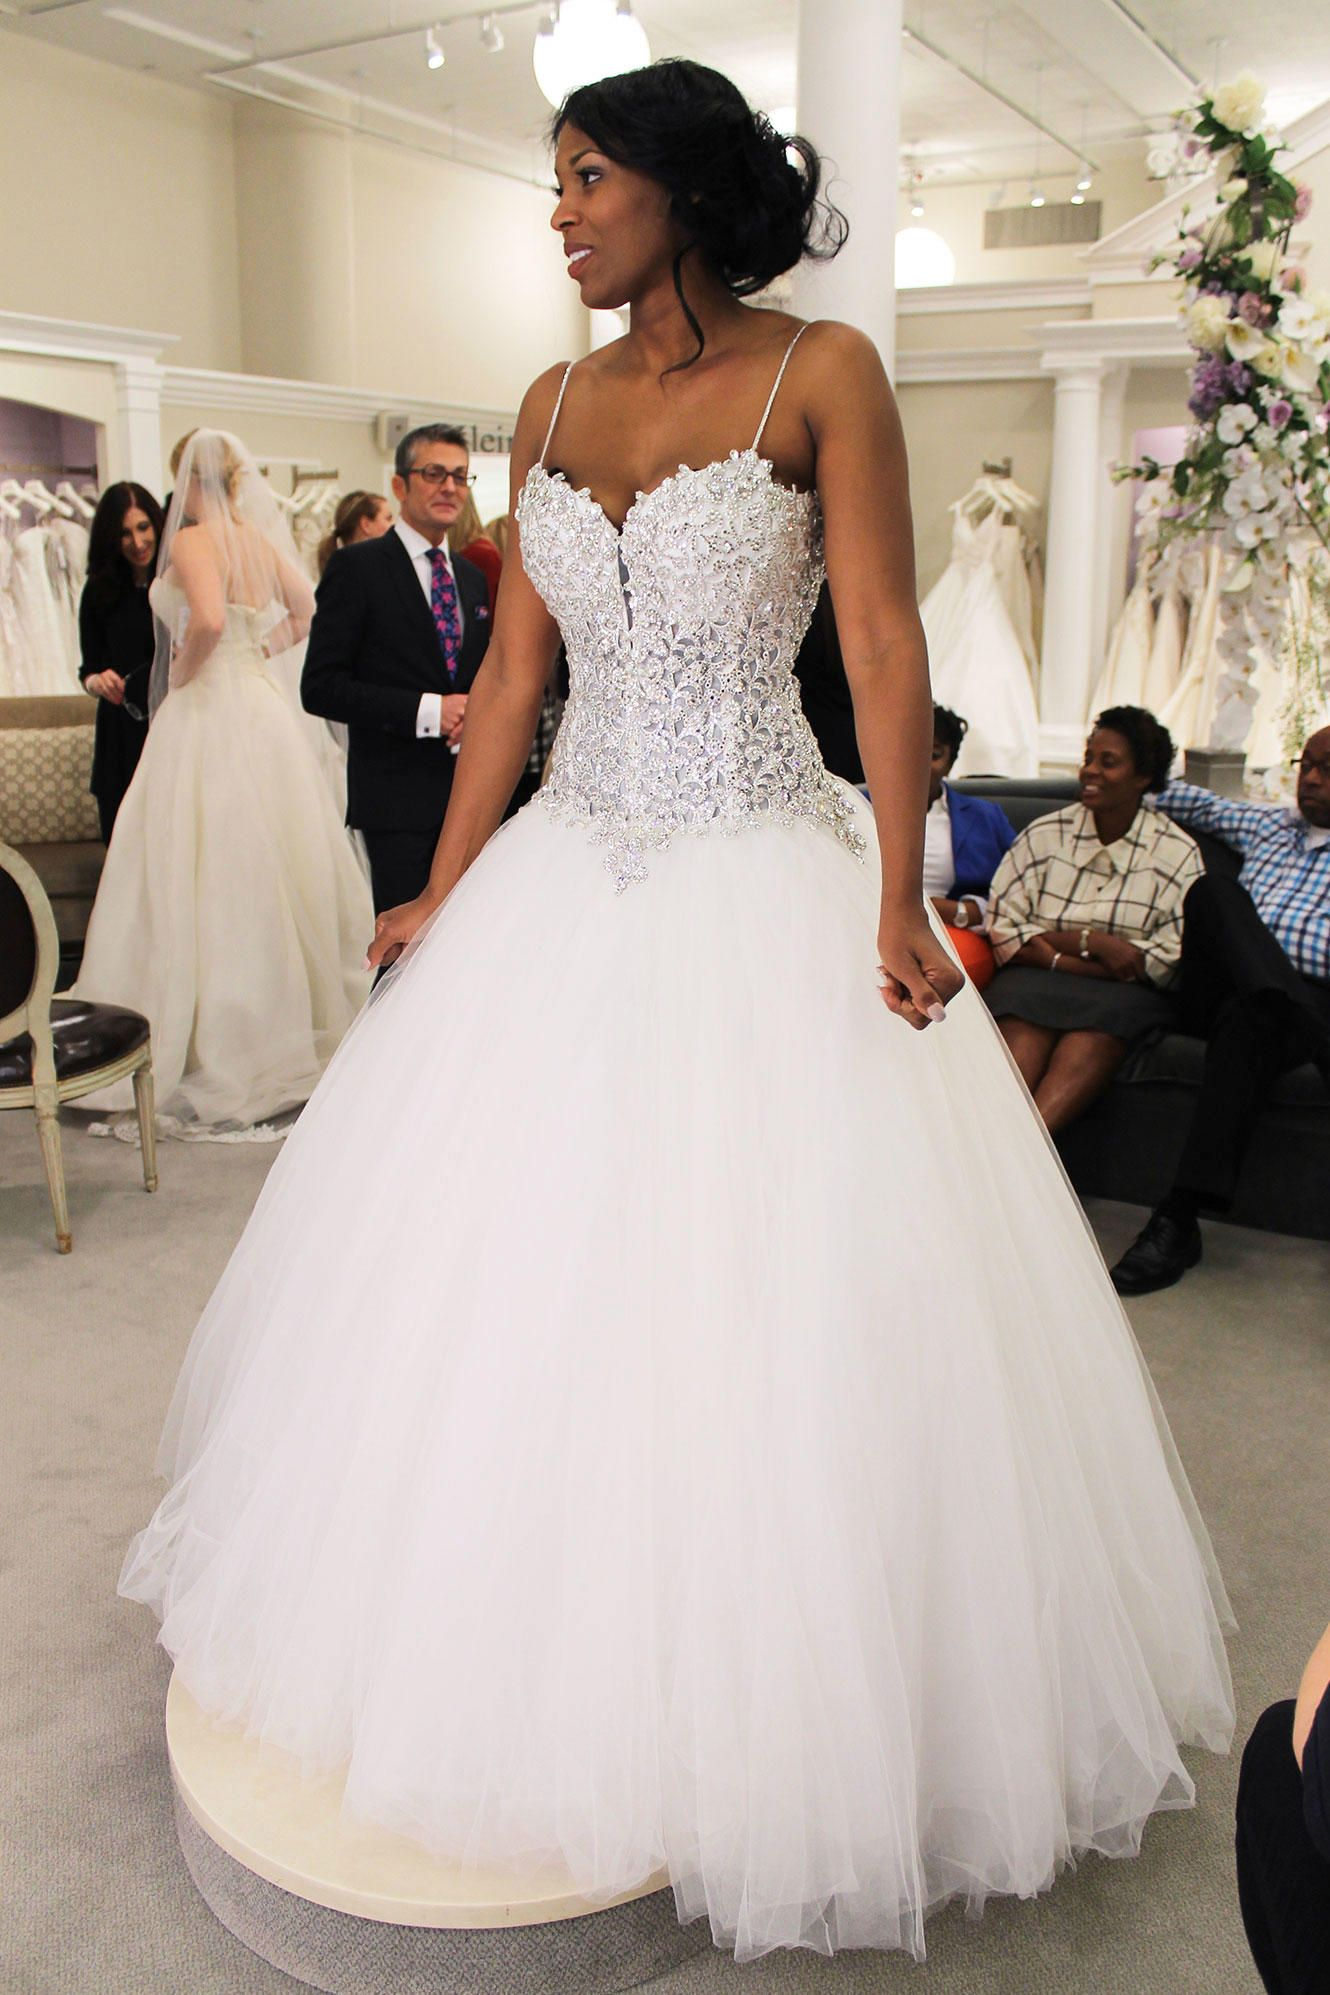 Official Site Bling Wedding Dress Wedding Dresses Corset Pinina Tornai Wedding Dresses